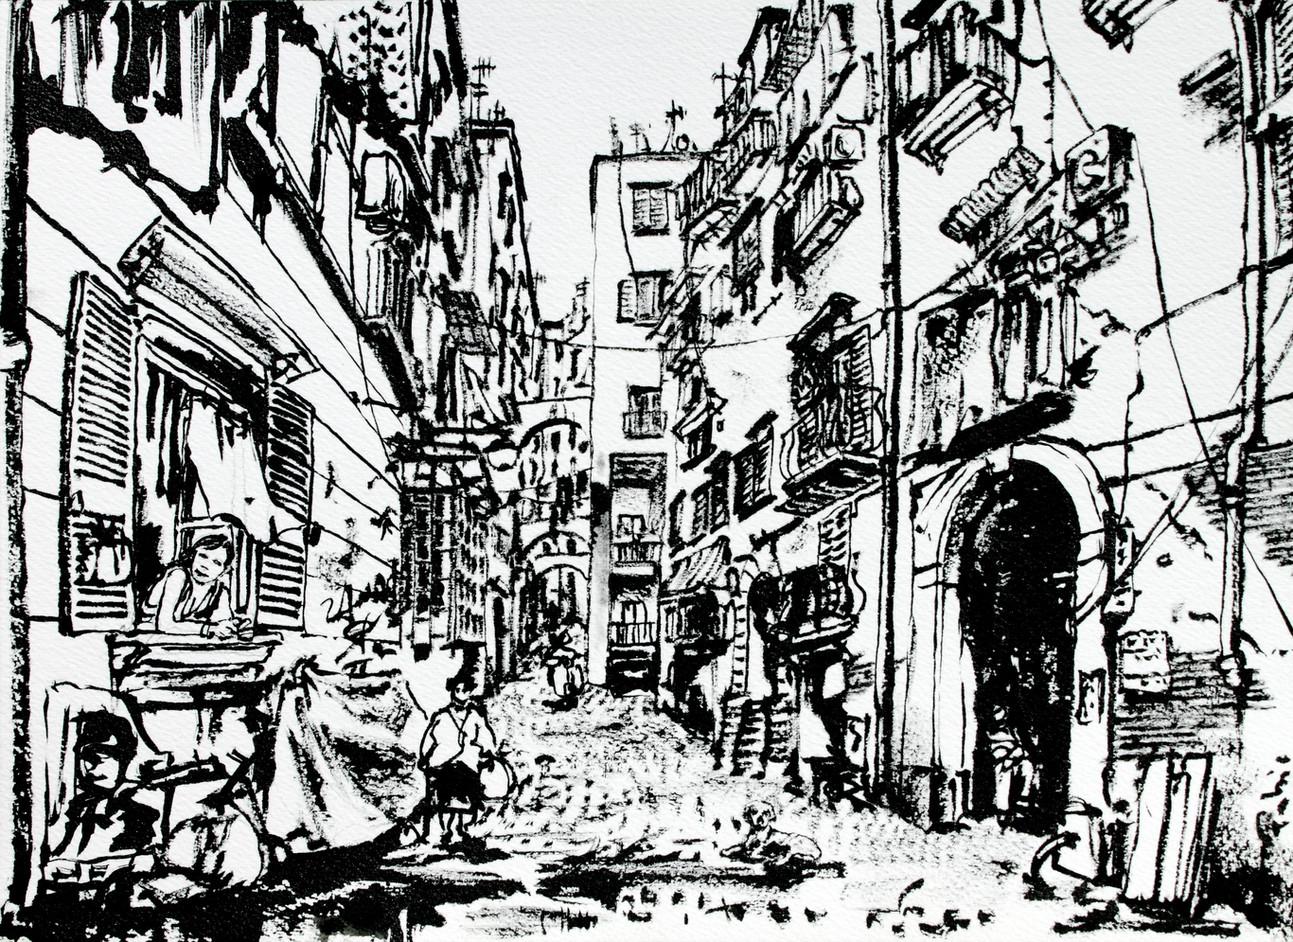 Quartieri Spagnoli #3